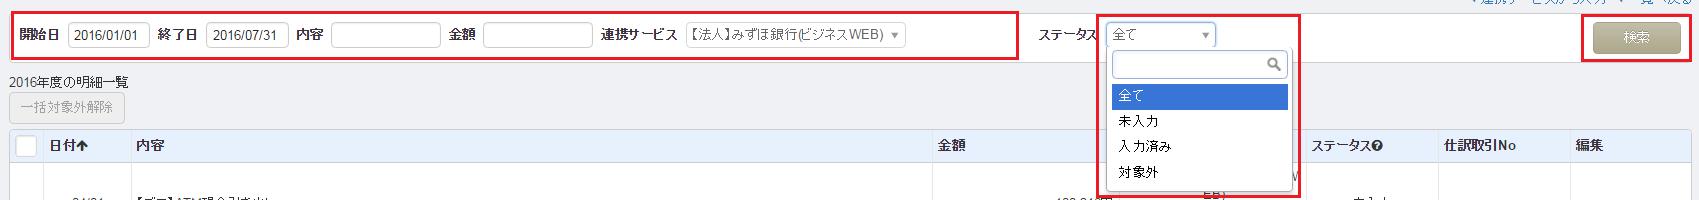 service_list_06